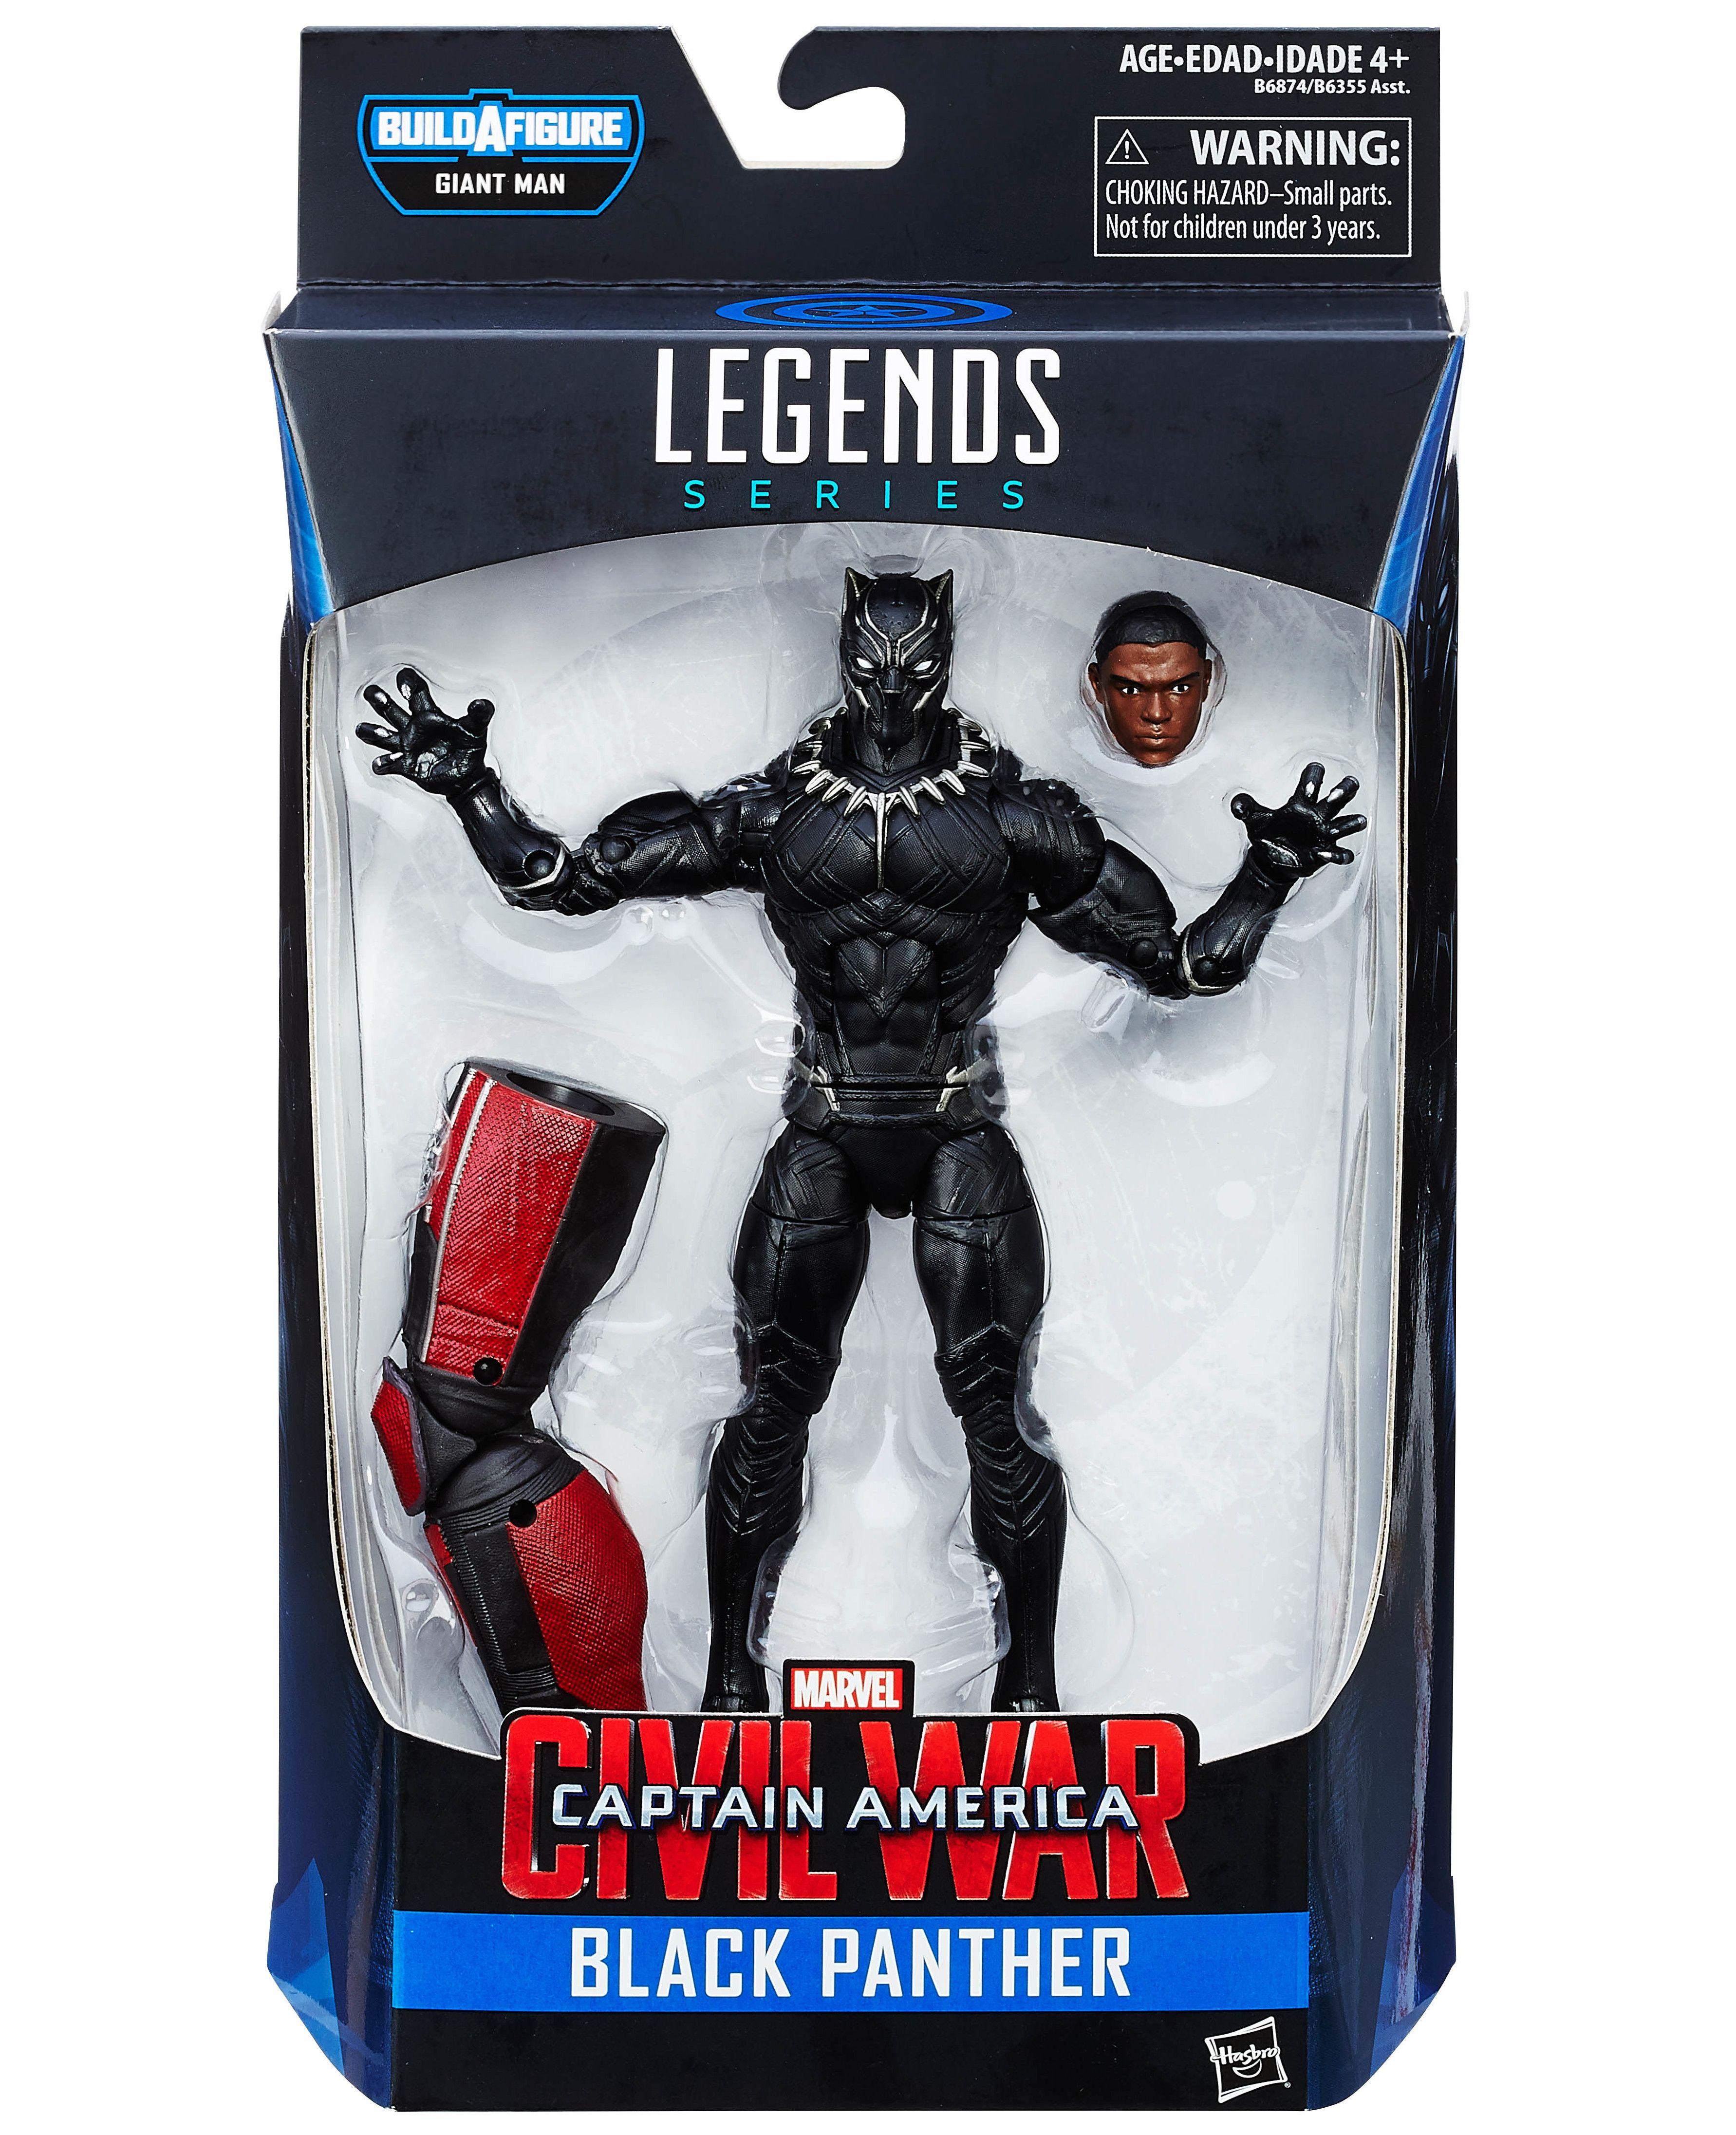 NEW 2017 Marvel Legends Series BLACK PANTHER  6 Inch Walmart Exclusive